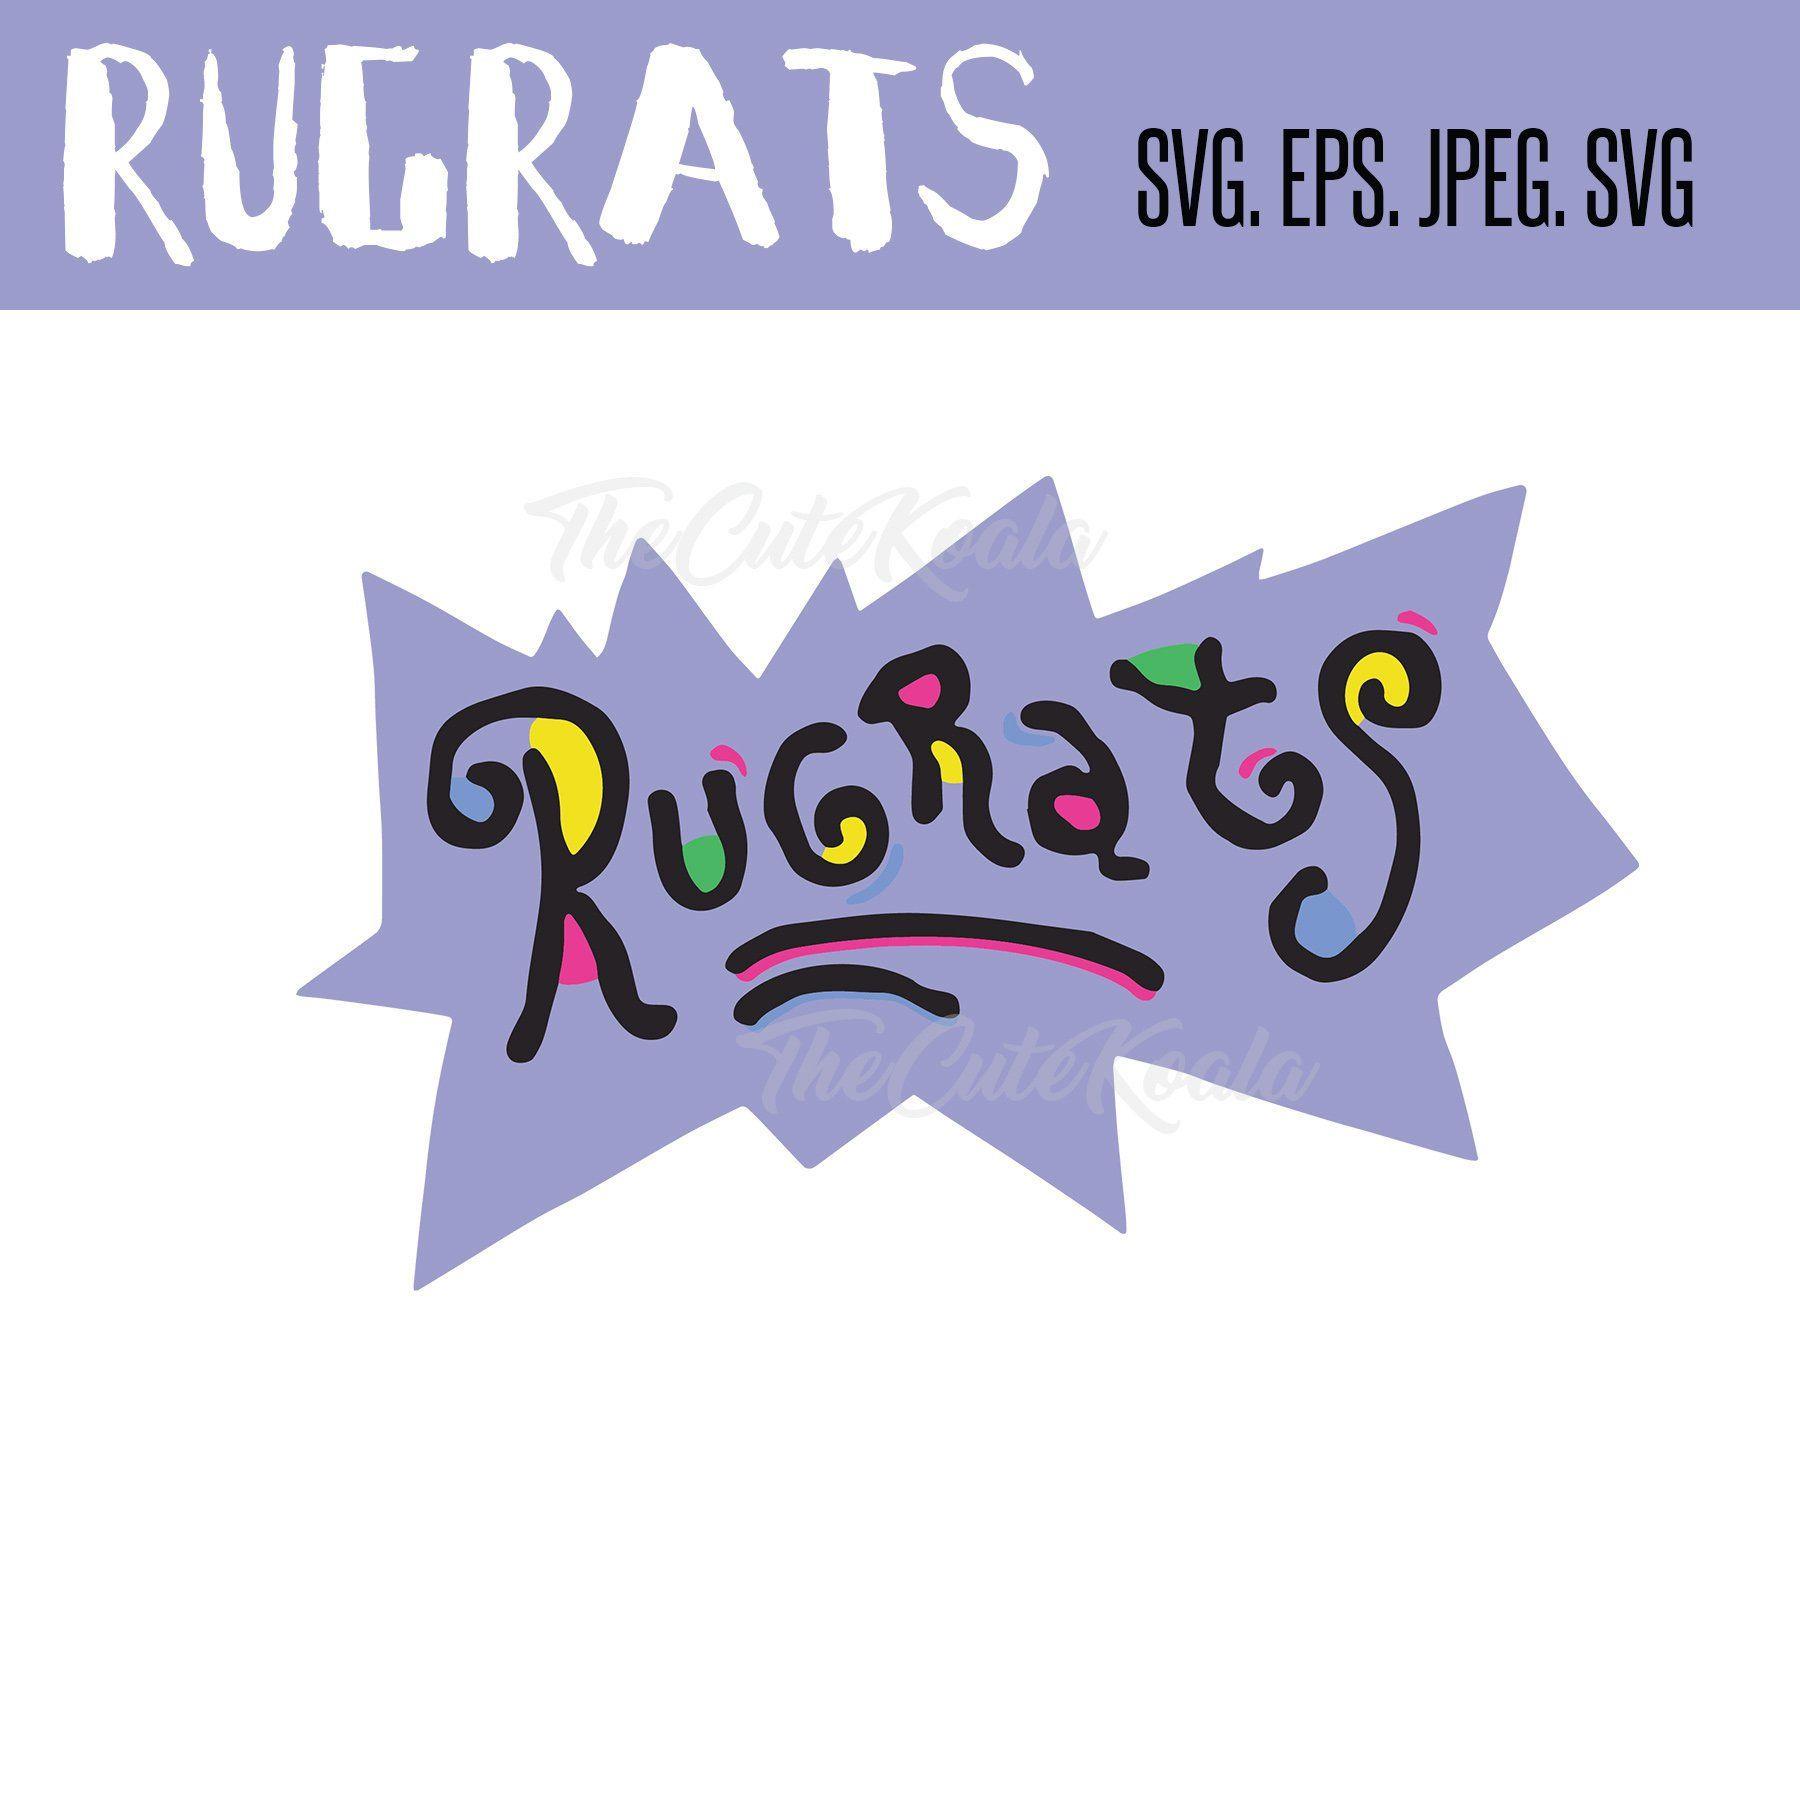 RUGRATS SVG File Rugrats, Svg file, Svg files for cricut